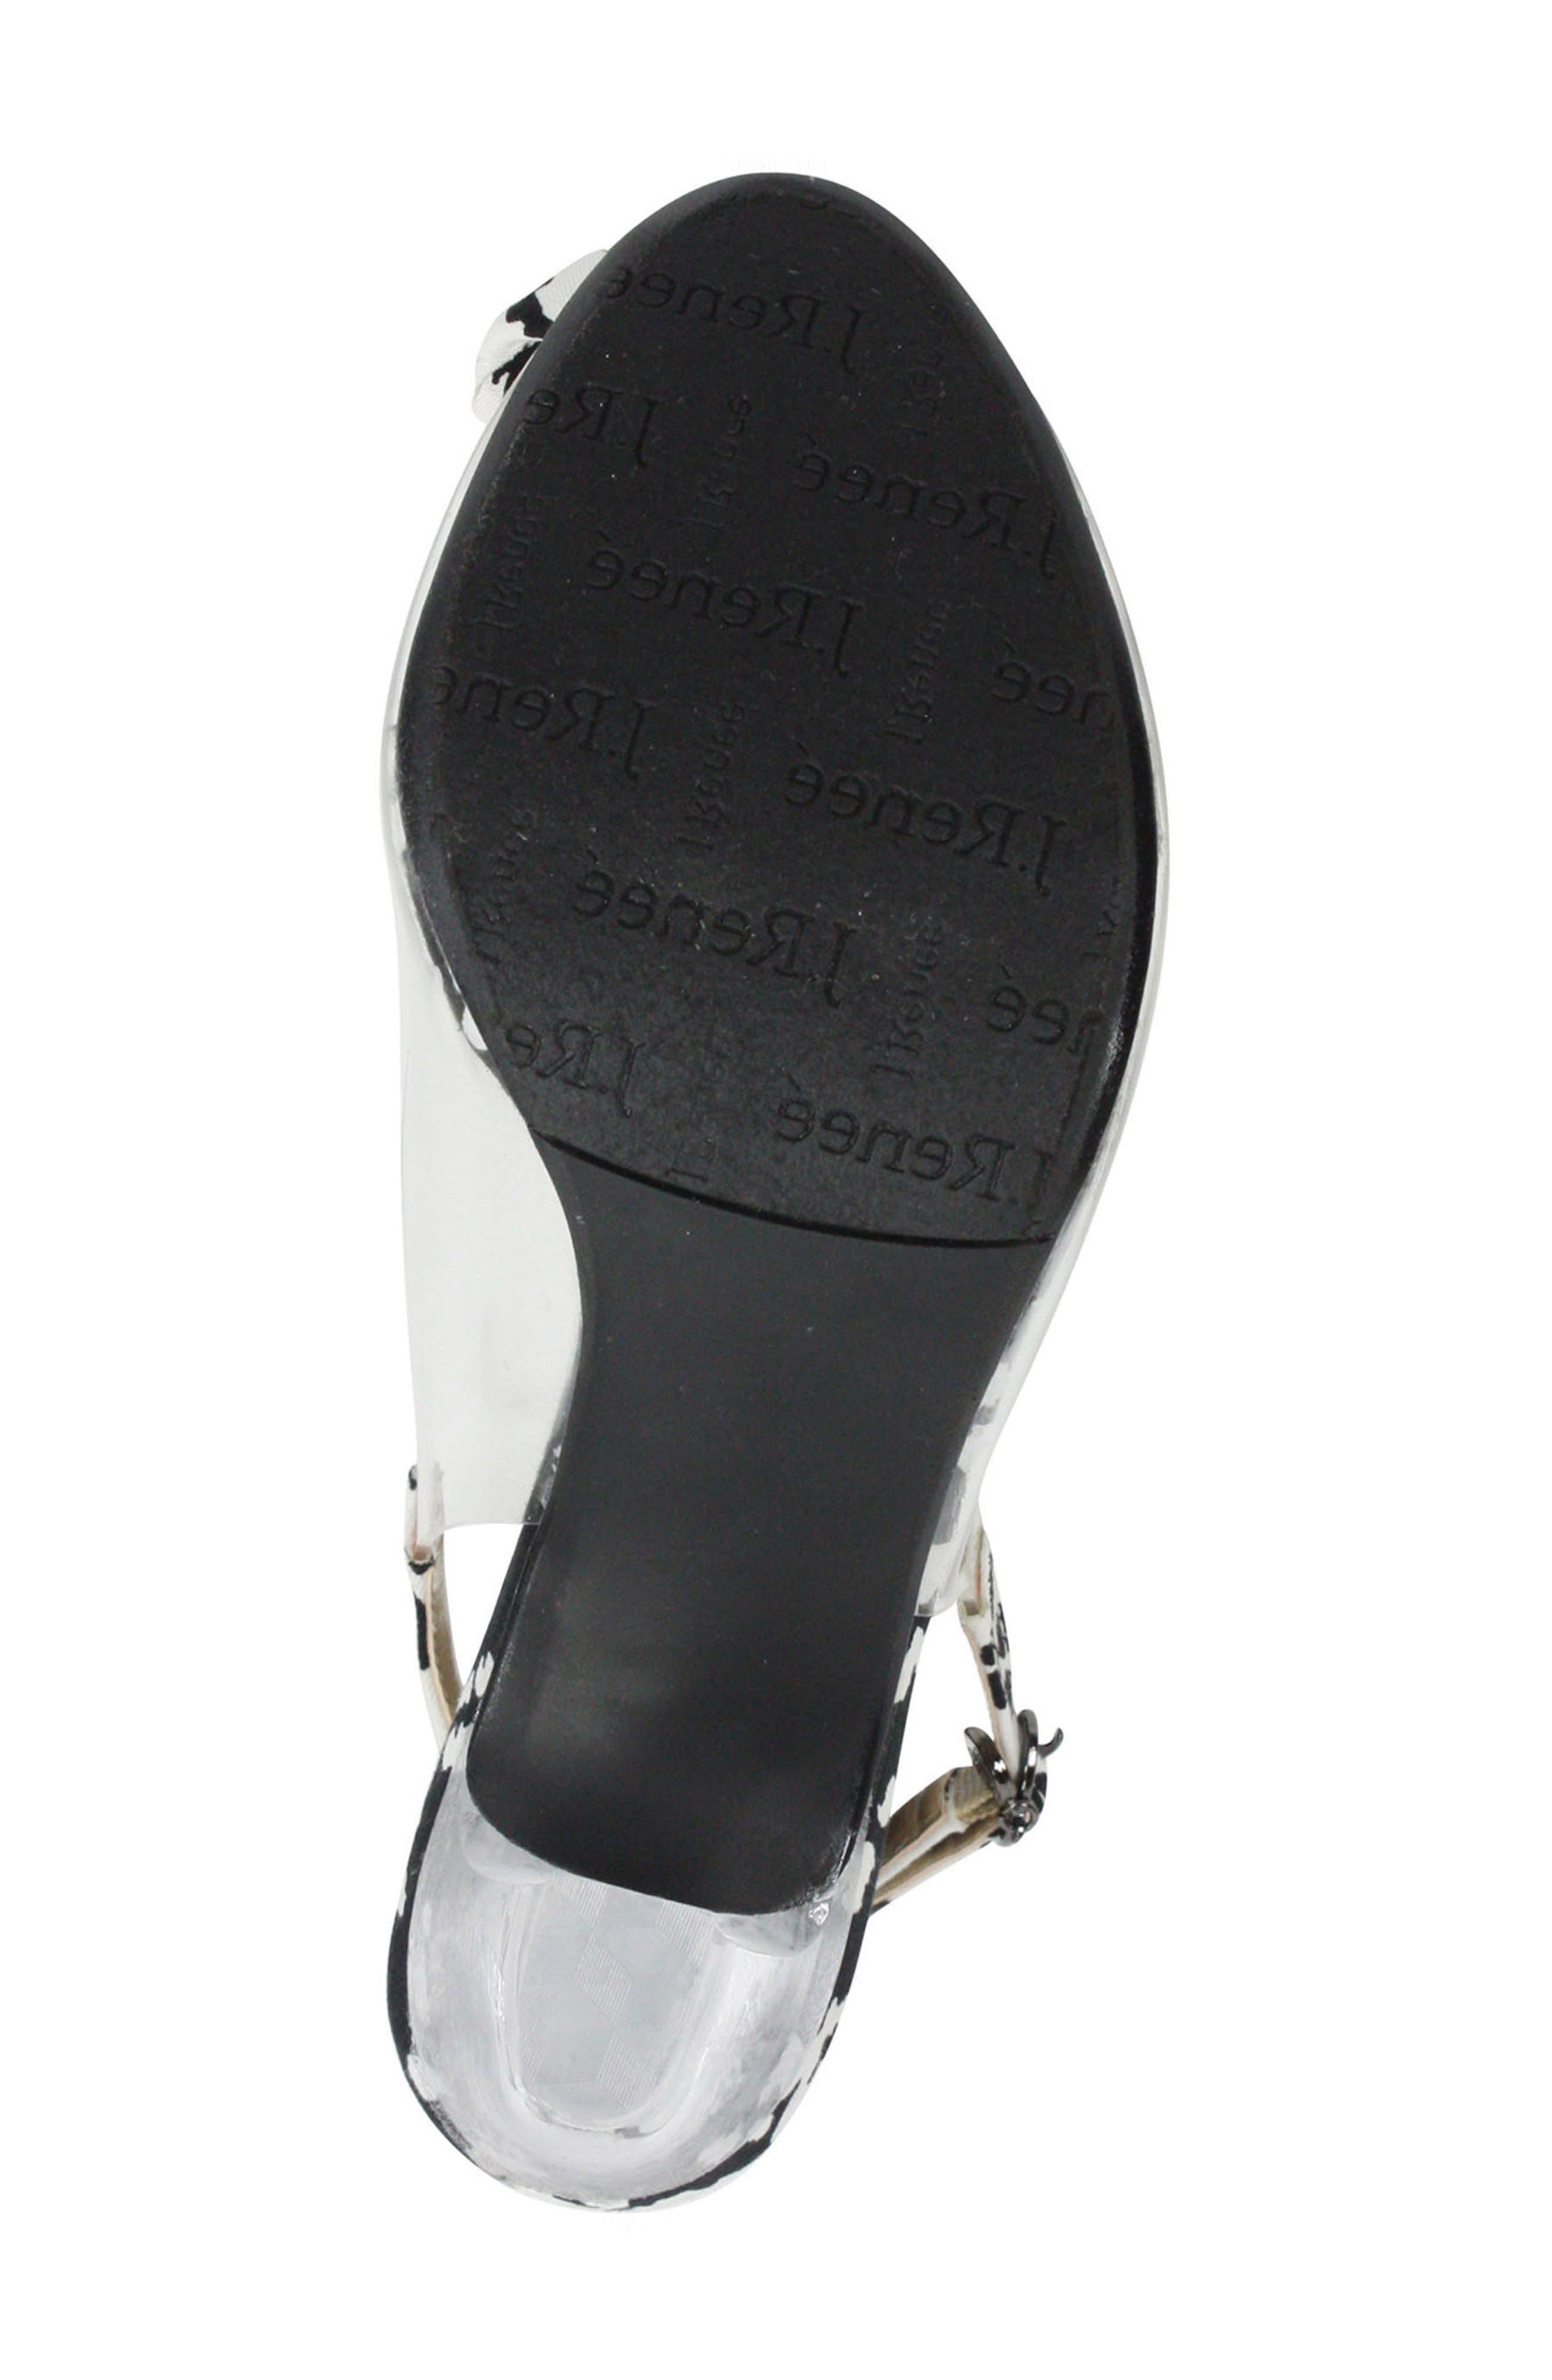 Adoracion Slingback Sandal,                             Alternate thumbnail 6, color,                             CLEAR/ BLACK/ WHITE